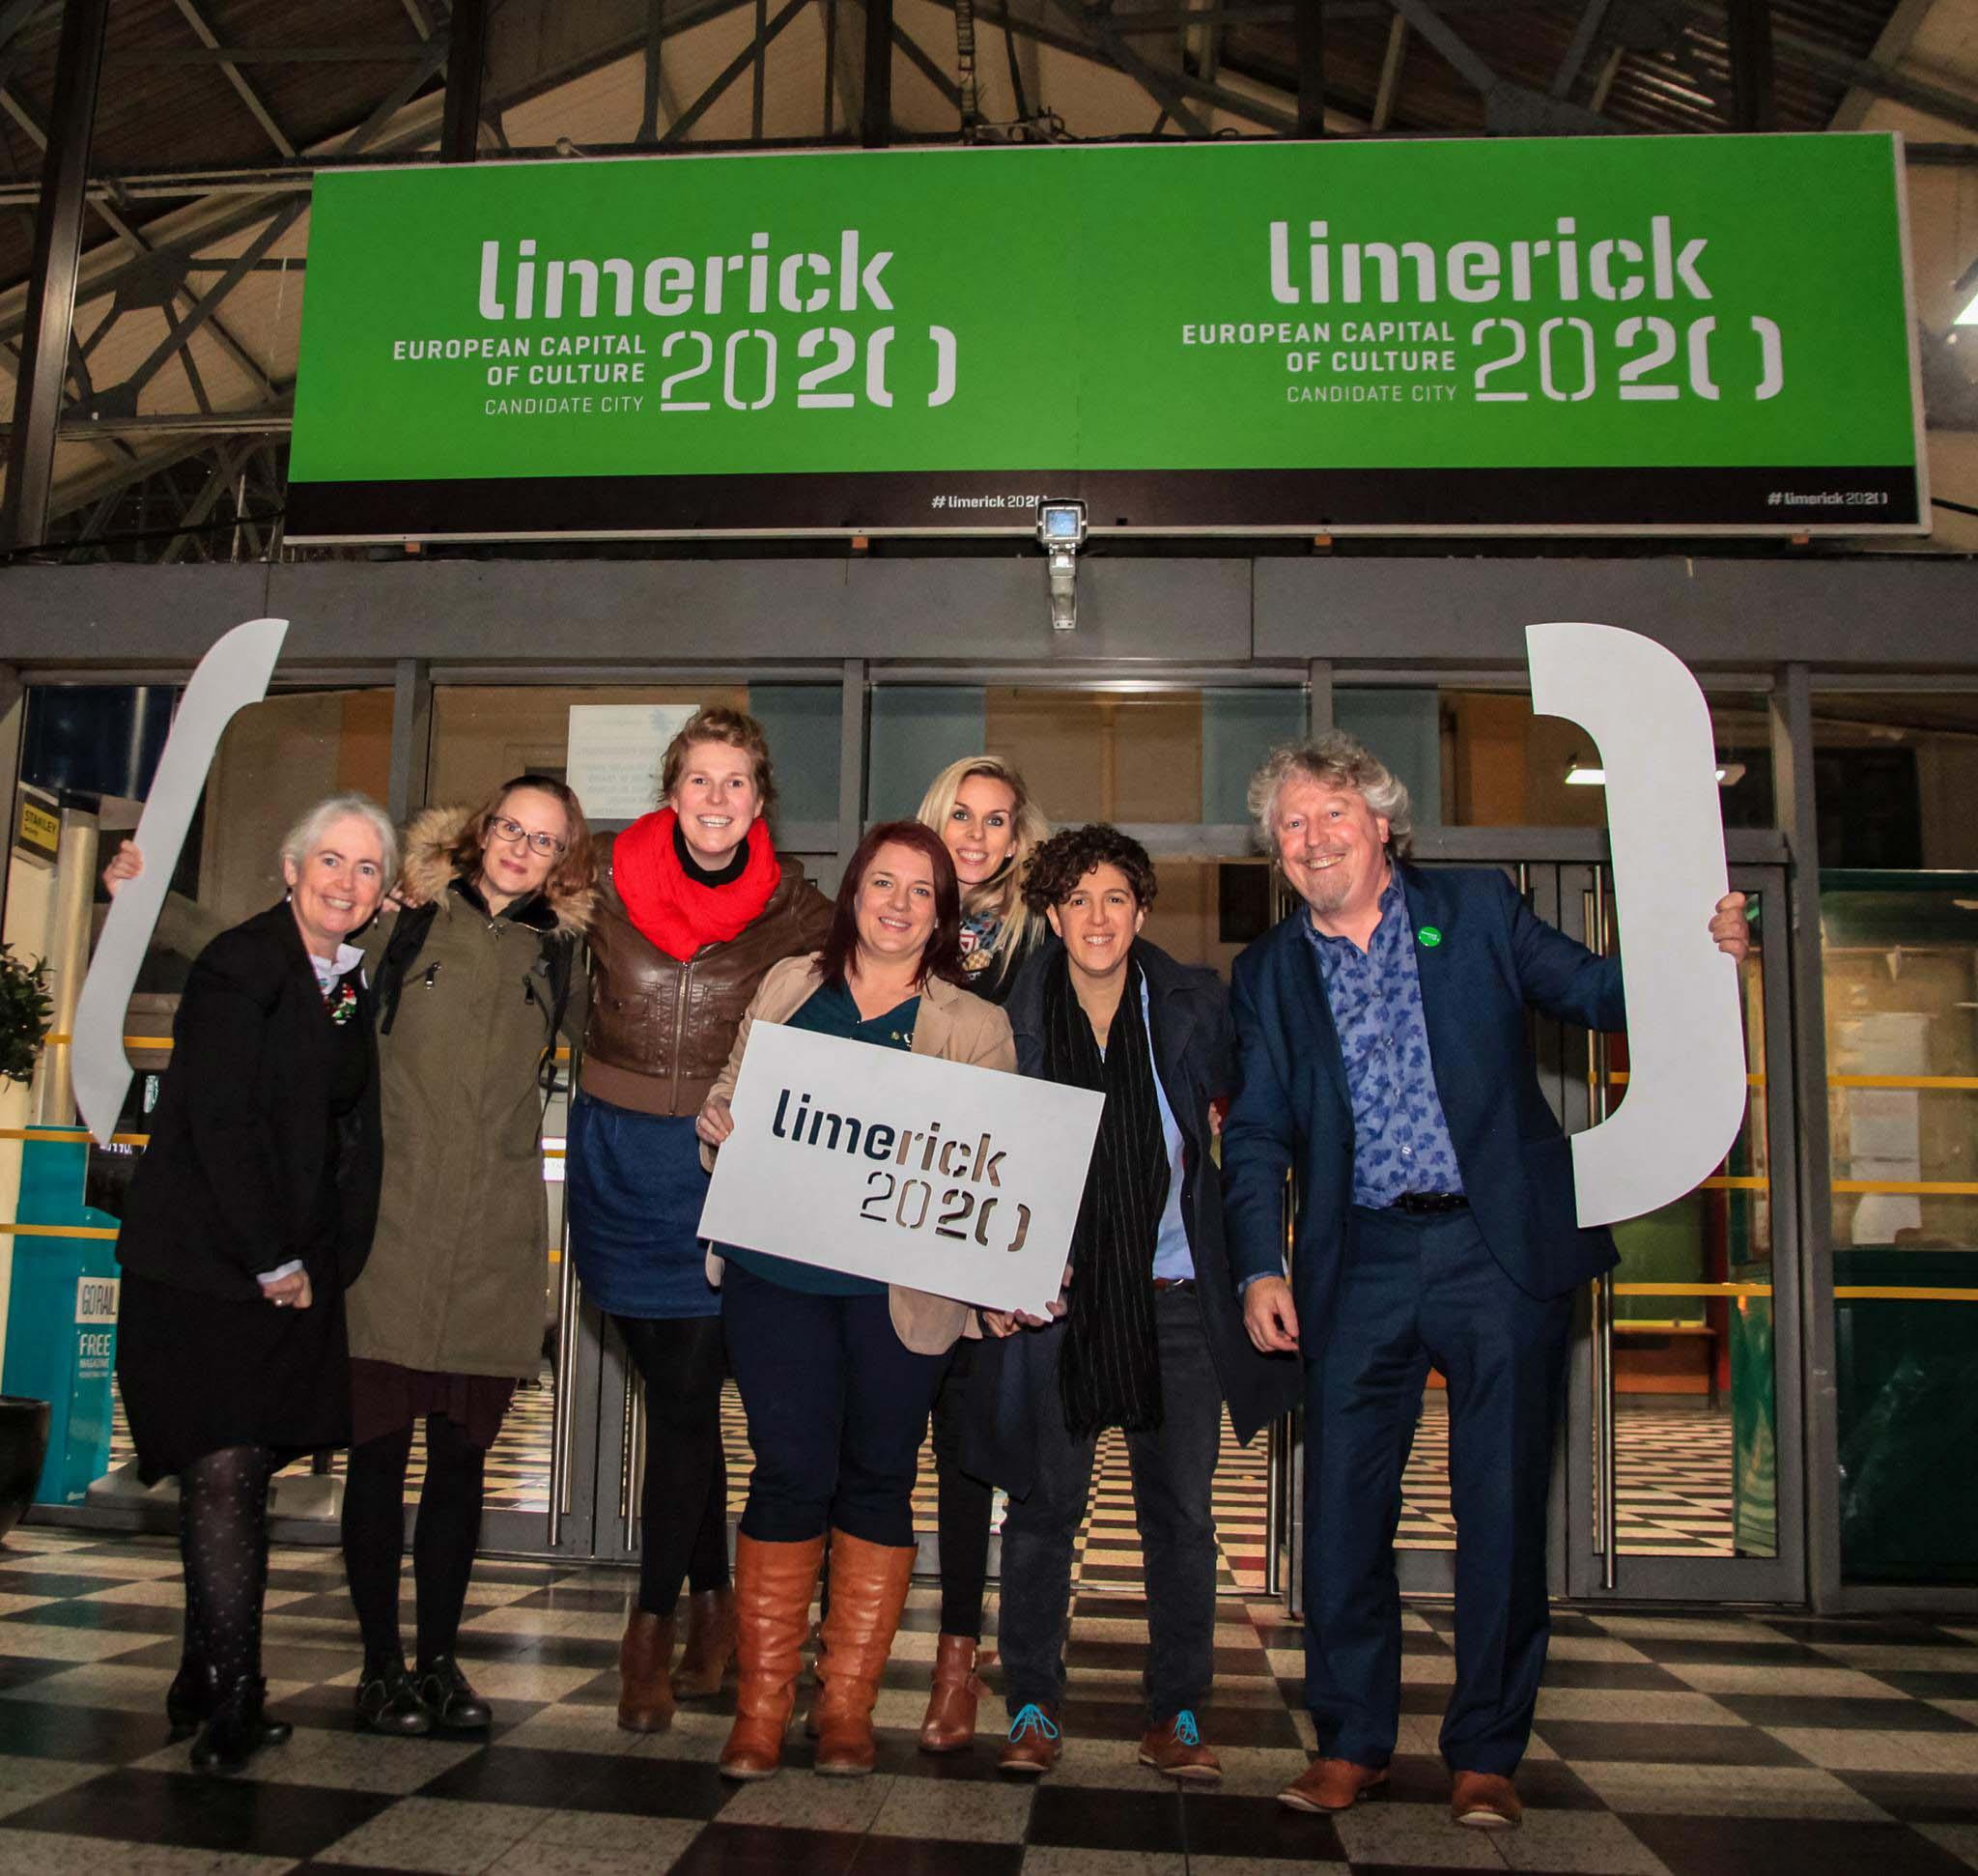 Limerick undergoes a cultural revolution